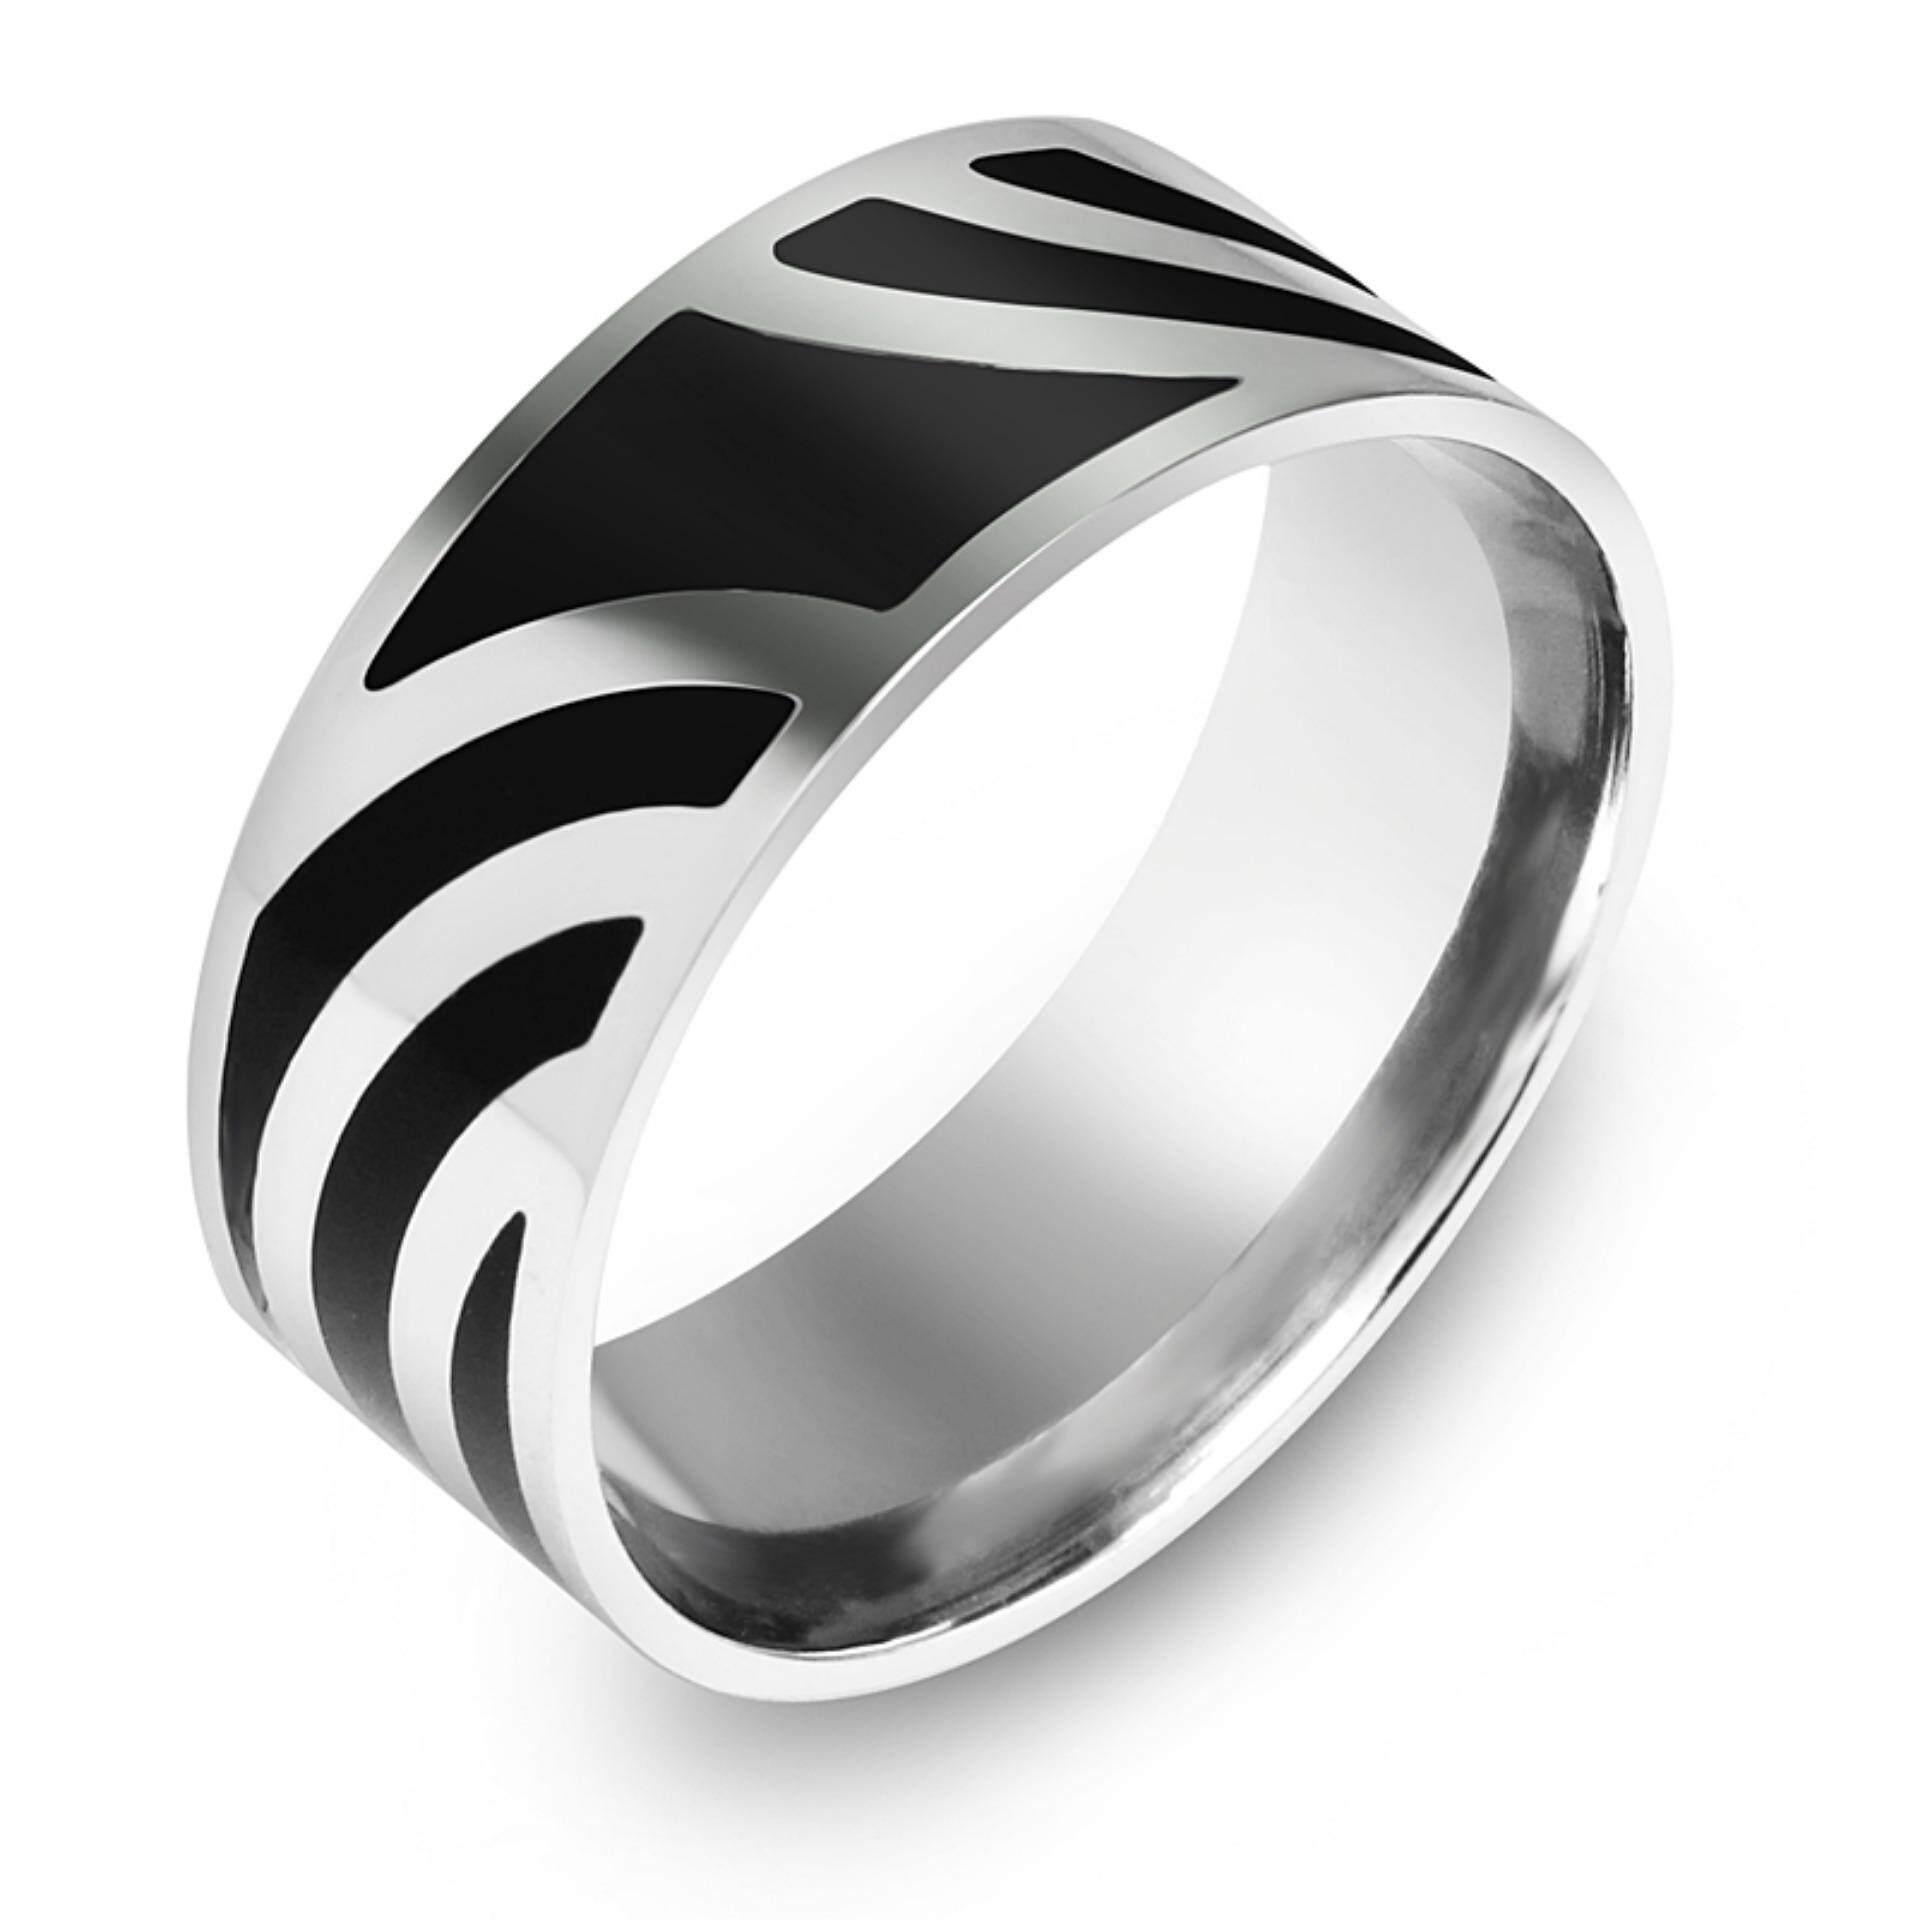 555jewelry แหวน รุ่น SNRN144 (สี Steel/Black Epoxy) (R9)